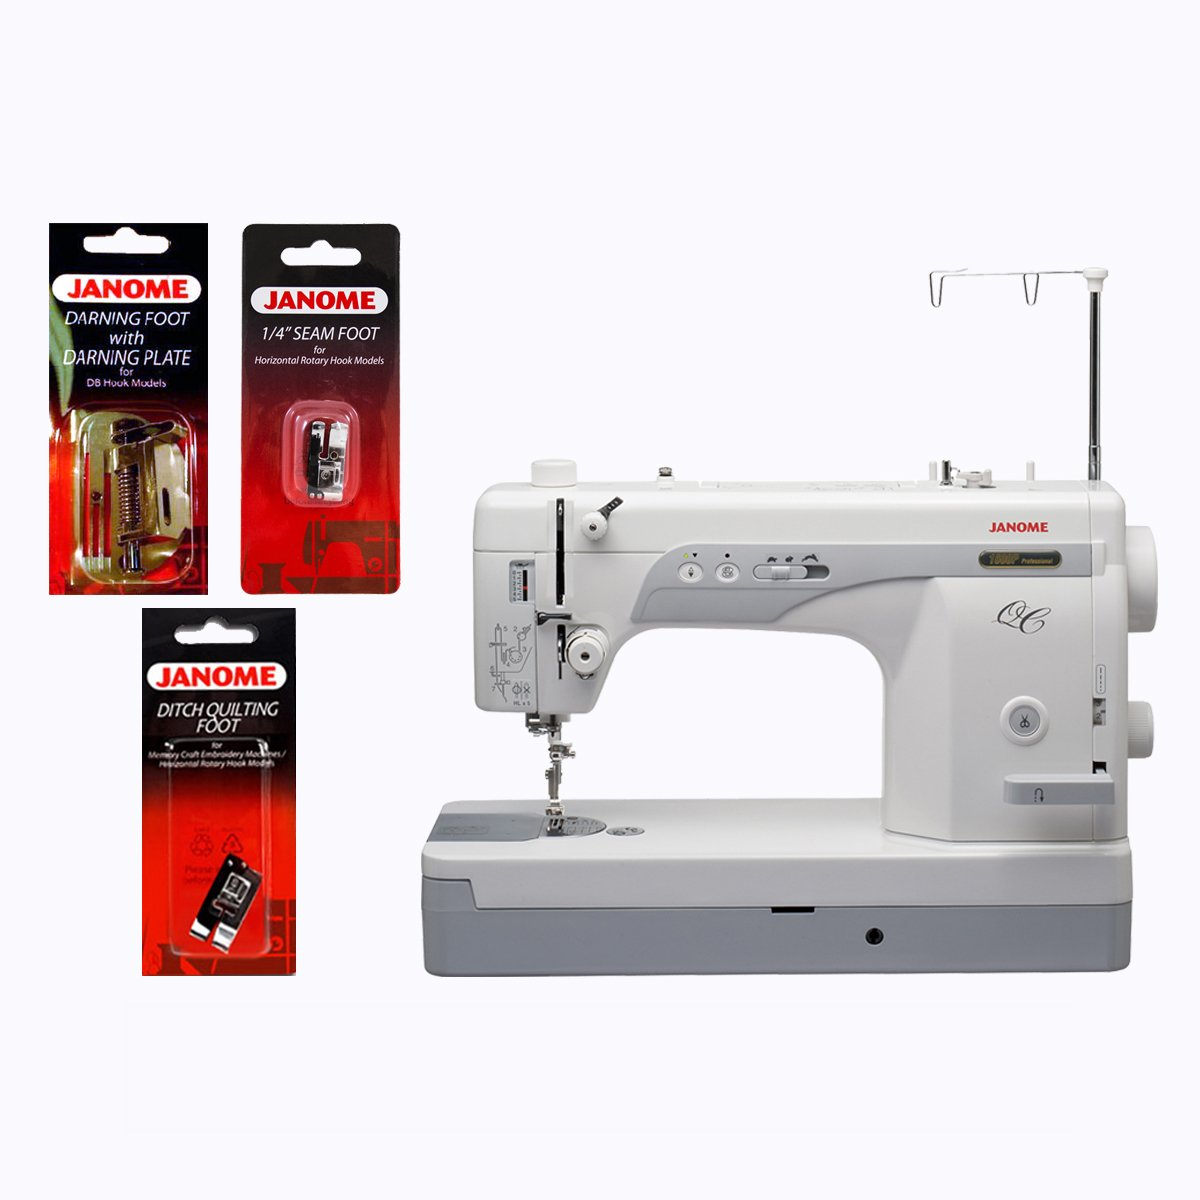 NEW Janome 1600P-QC Straight-Stitch Machine and Kit FREE SHIPPING | eBay